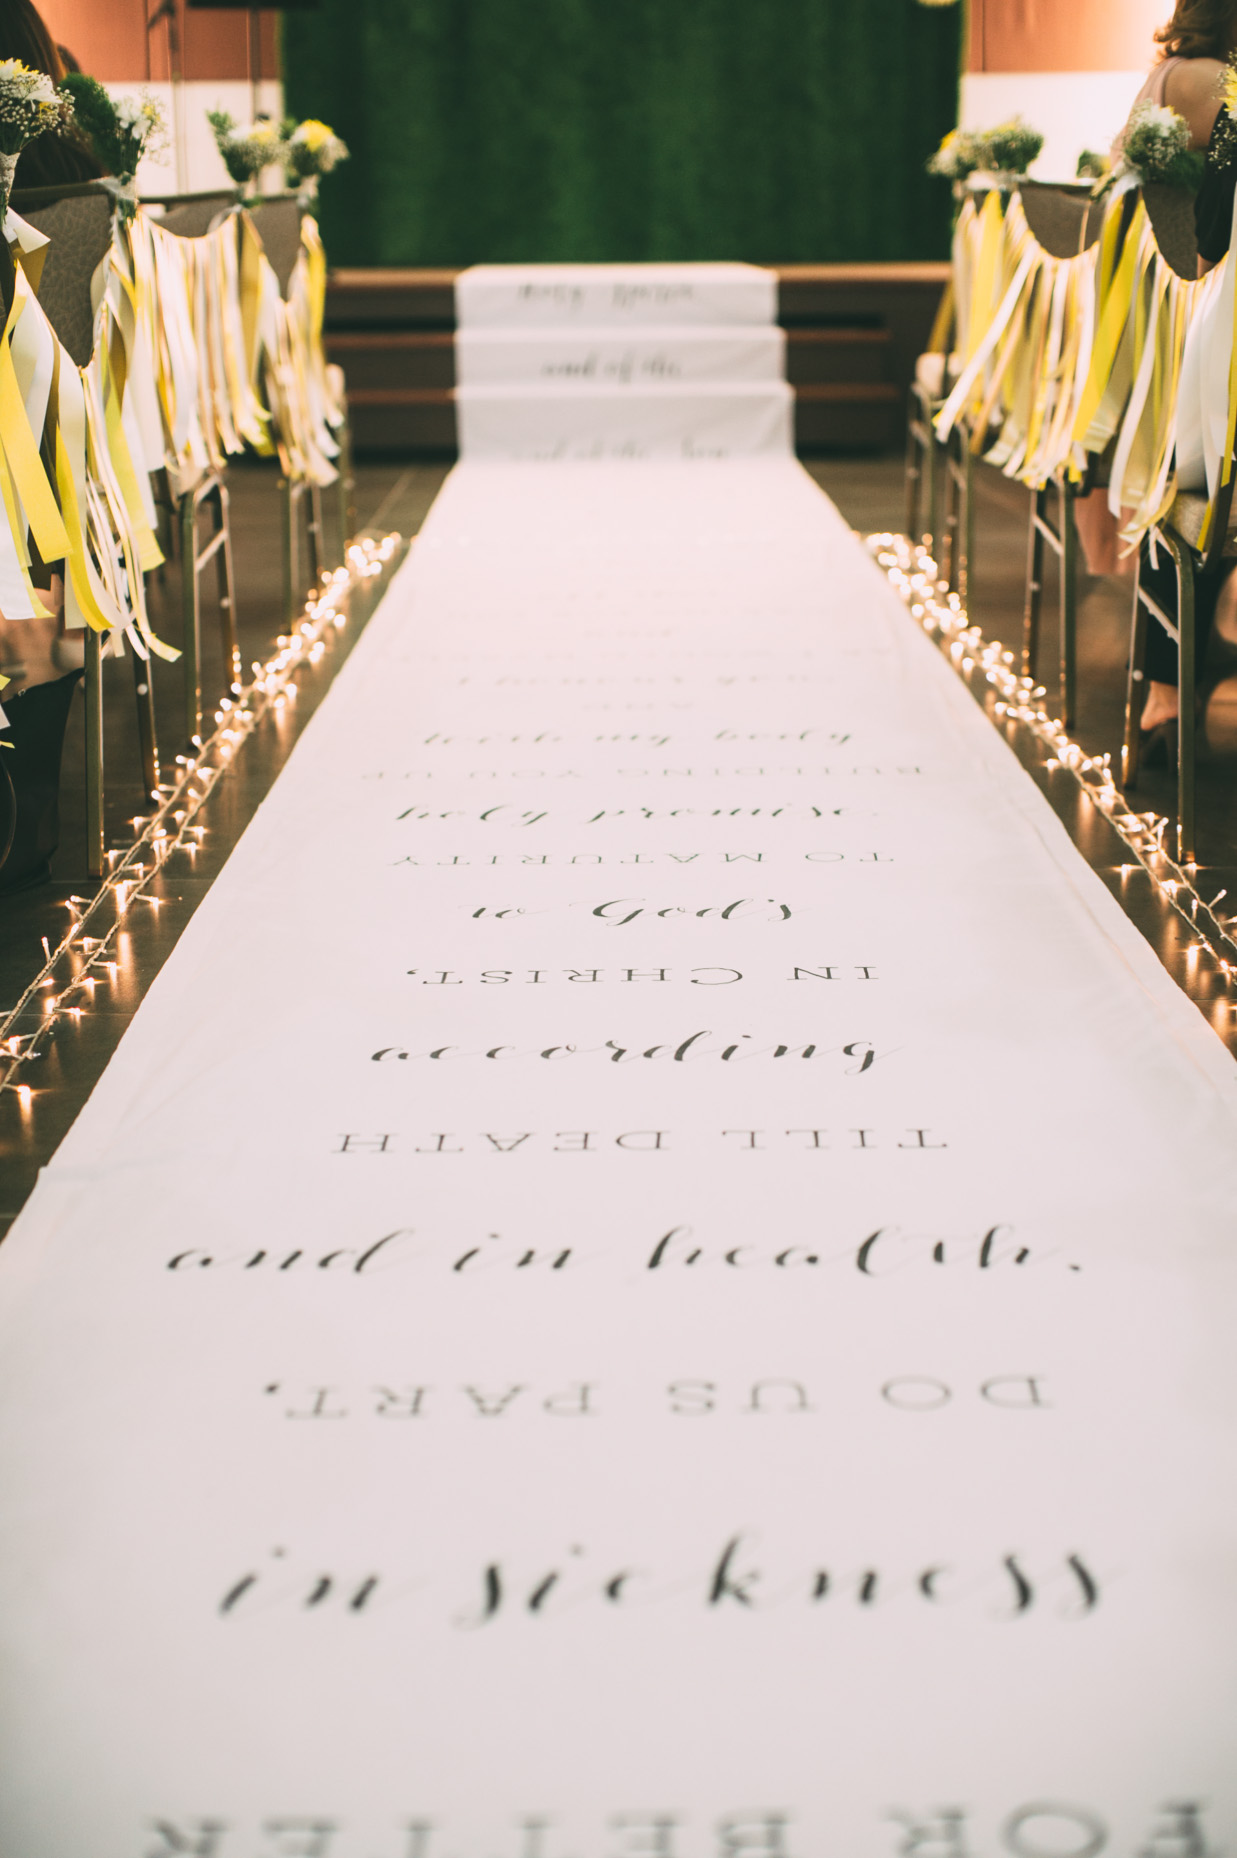 39-hellojanelee-sam grace-malaysia-wedding-day